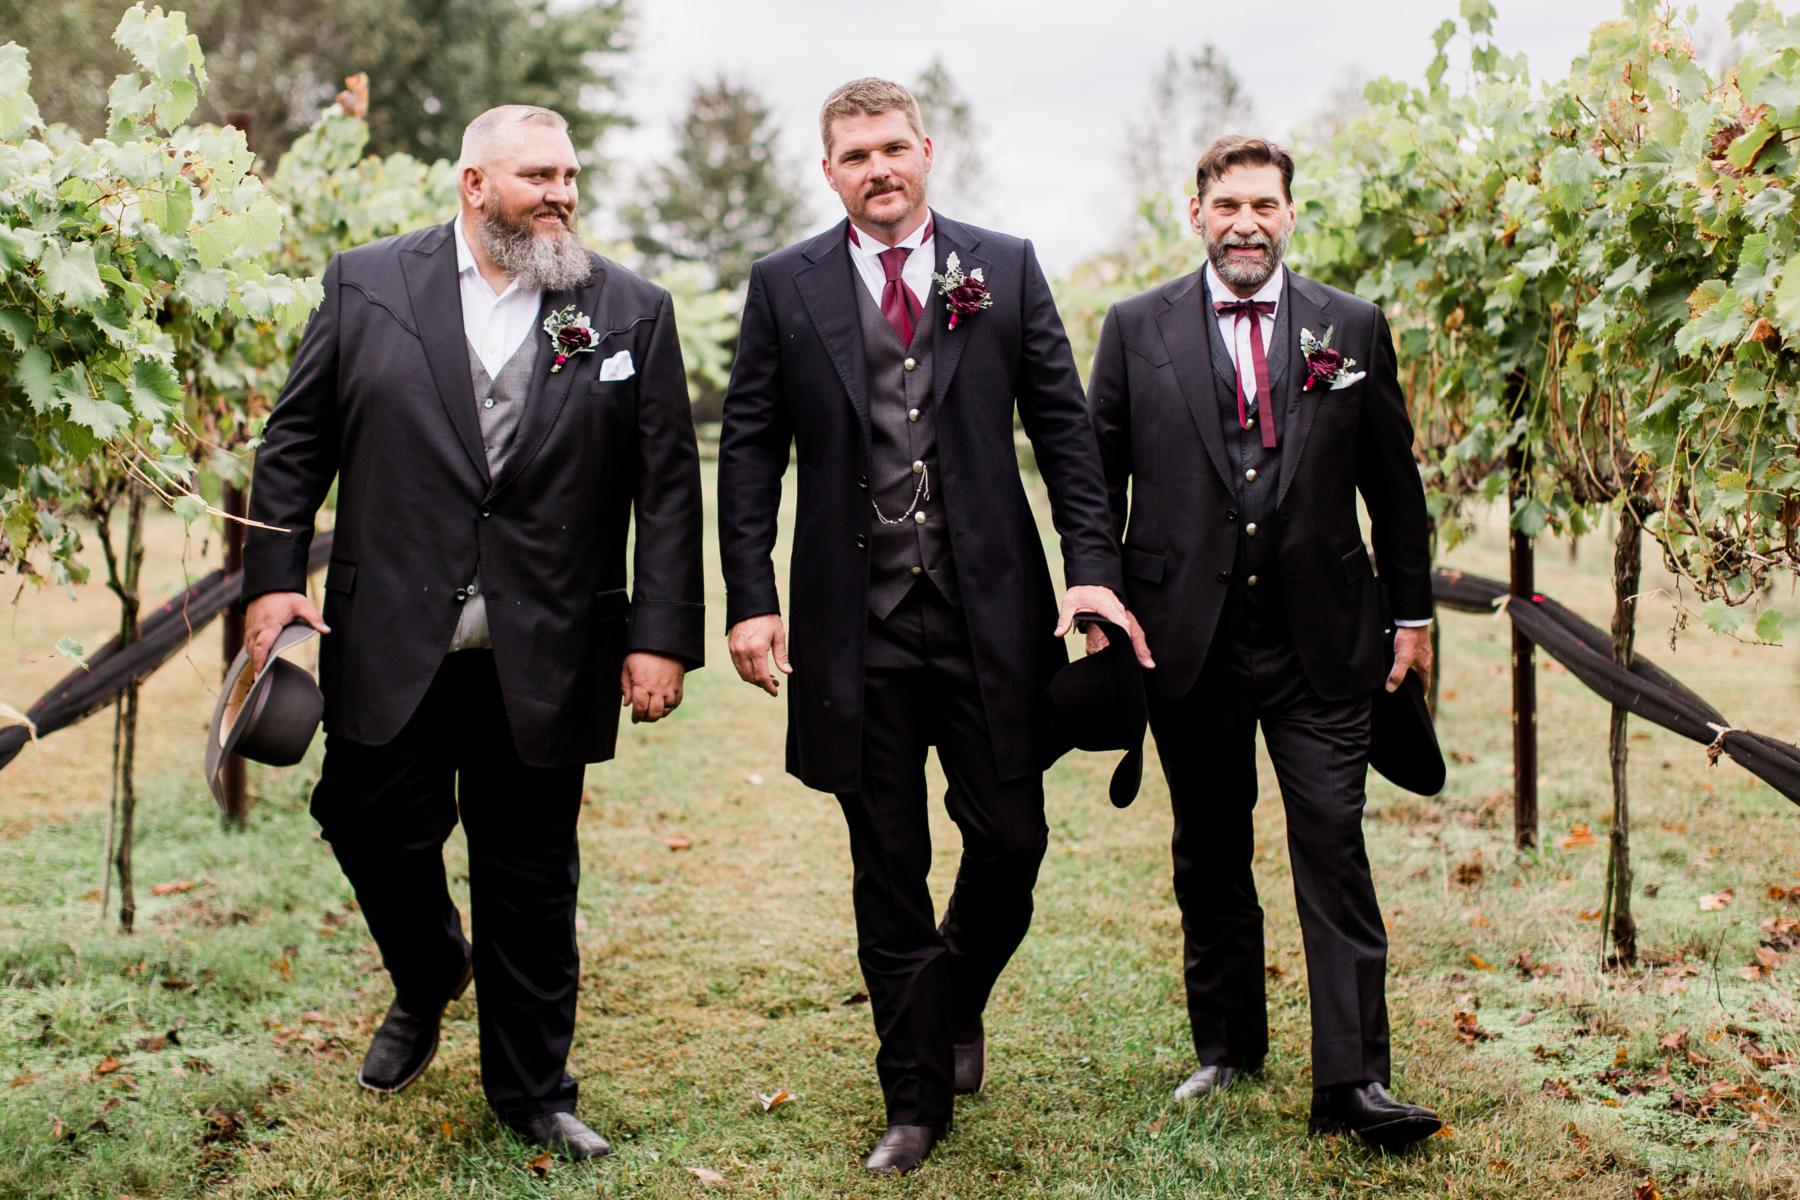 Groom and groomsmen wedding attire